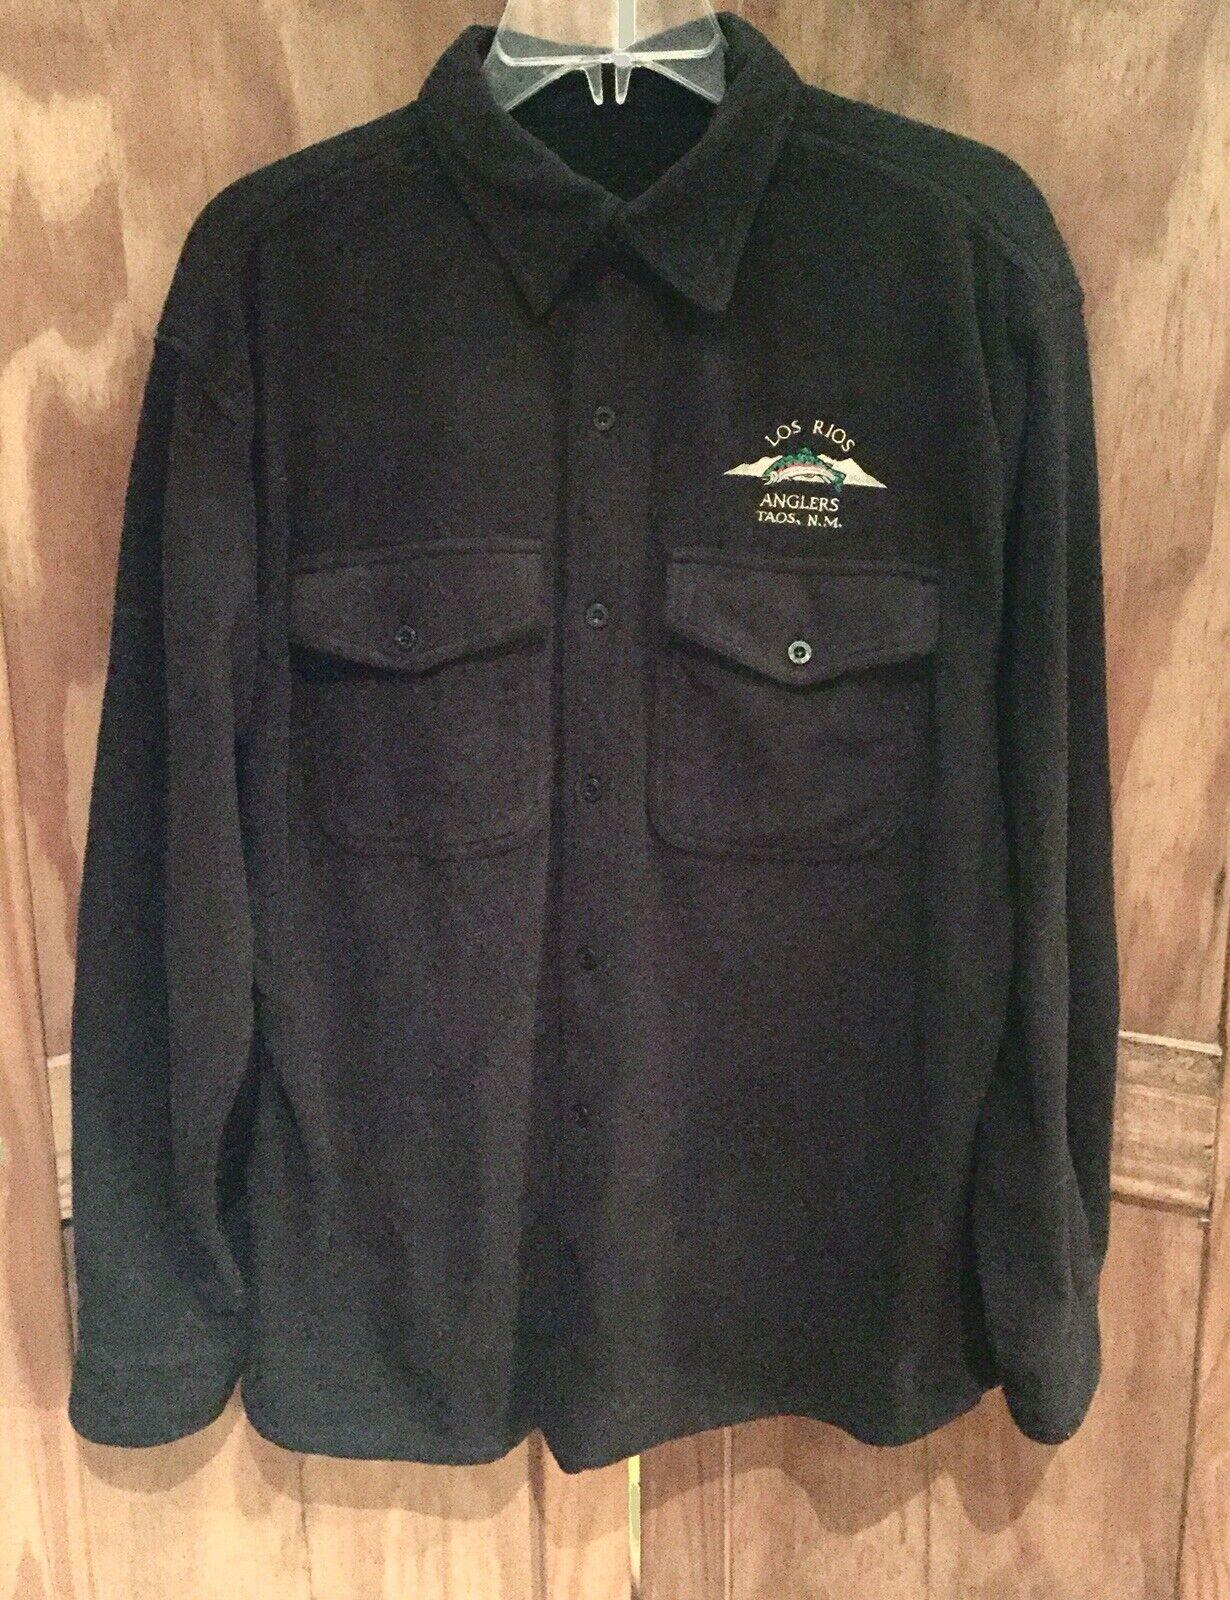 """LOS RIOS ANGLERS"", Taos  NM - outdoors  Fishing Polar Fleece LS Shirt Blk, Large  online shopping sports"